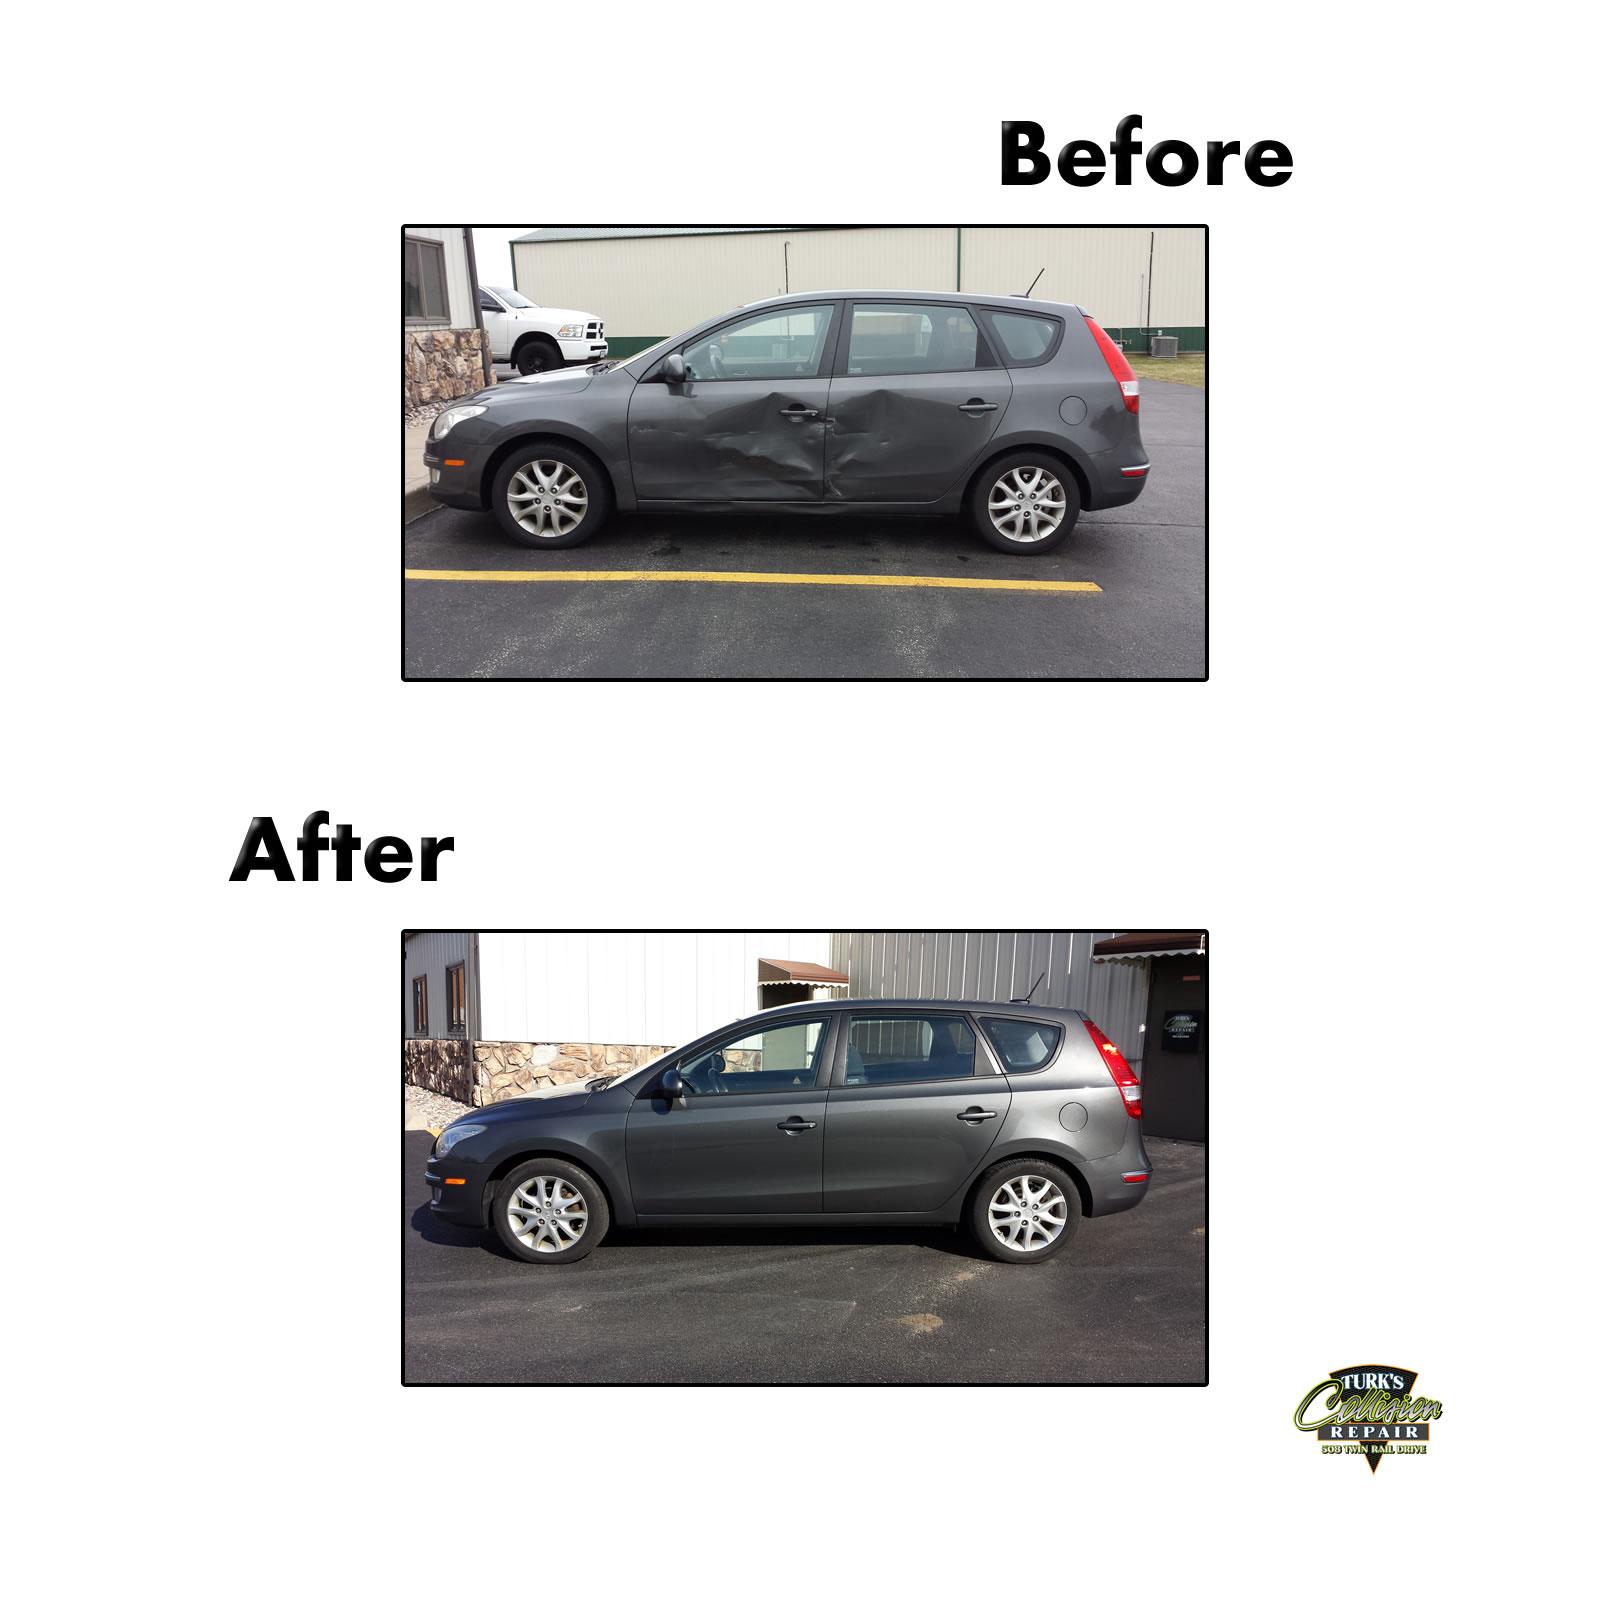 Hyundai Elantra Auto Body Repair Minooka